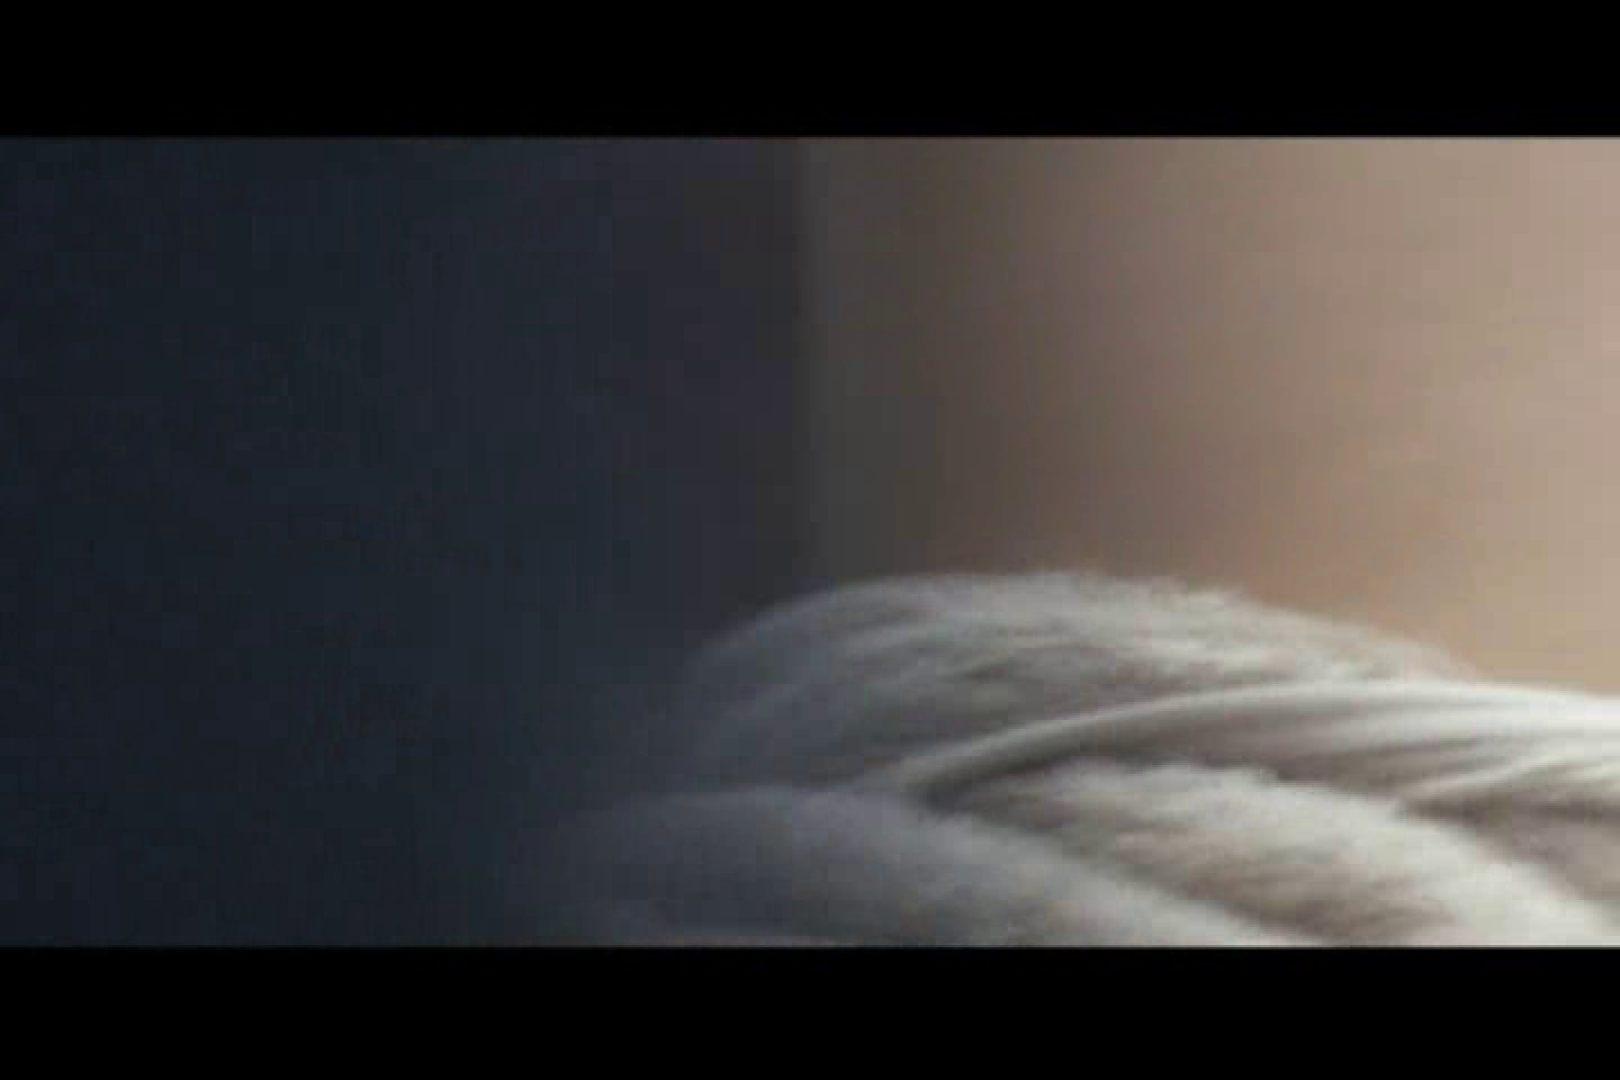 独占配信!無修正! 看護女子寮 vol.12 ナースのエロ動画 SEX無修正画像 78PIX 44